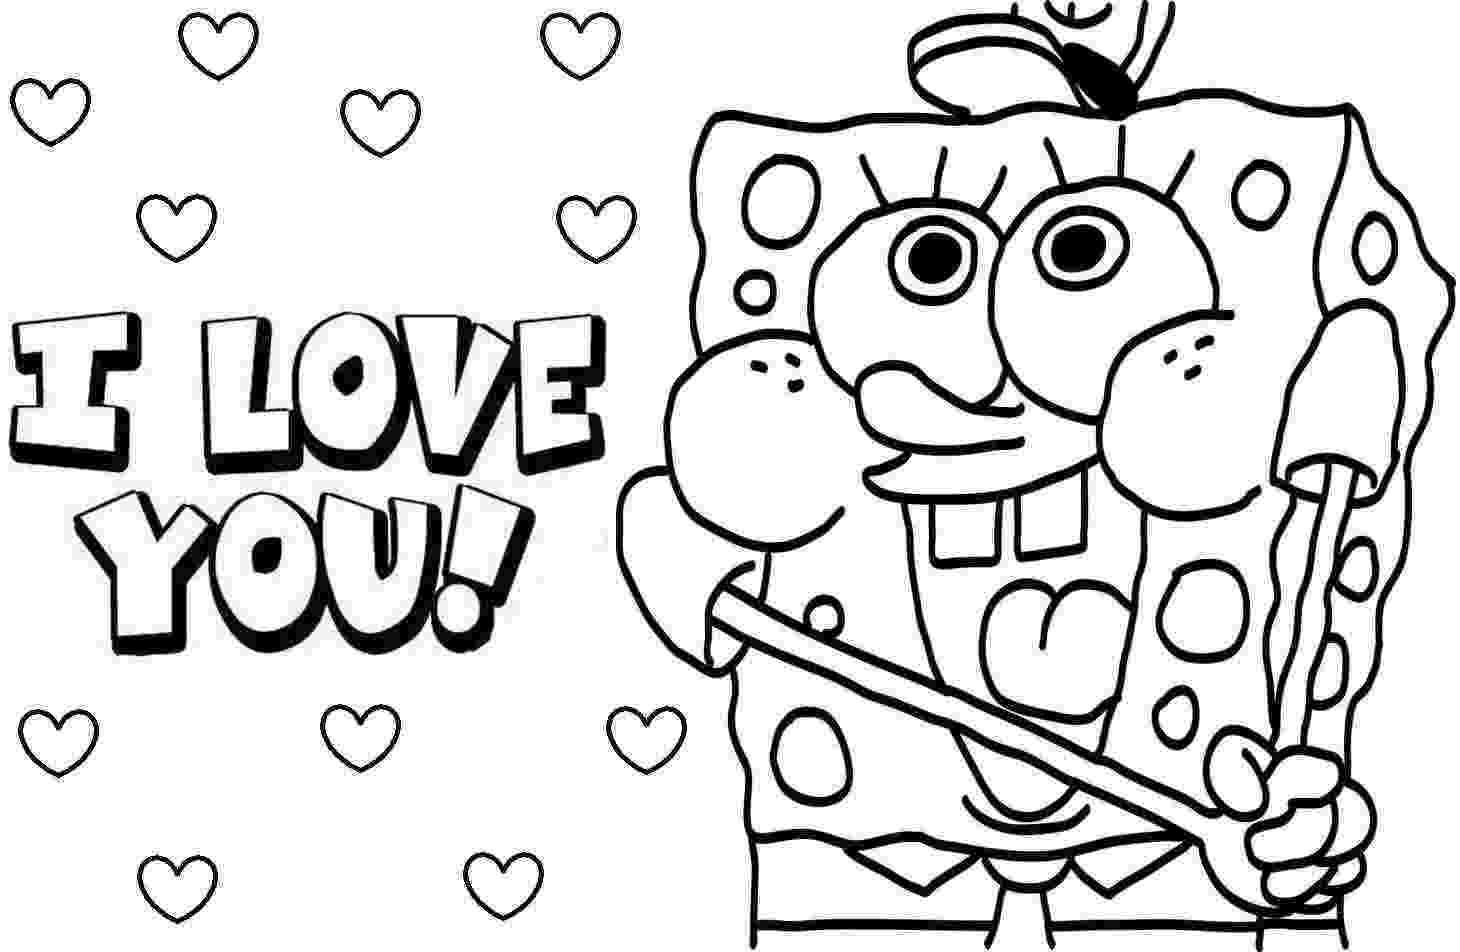 sponge bob coloring page spongebob squarepants coloring pages spongebob coloring coloring bob page sponge